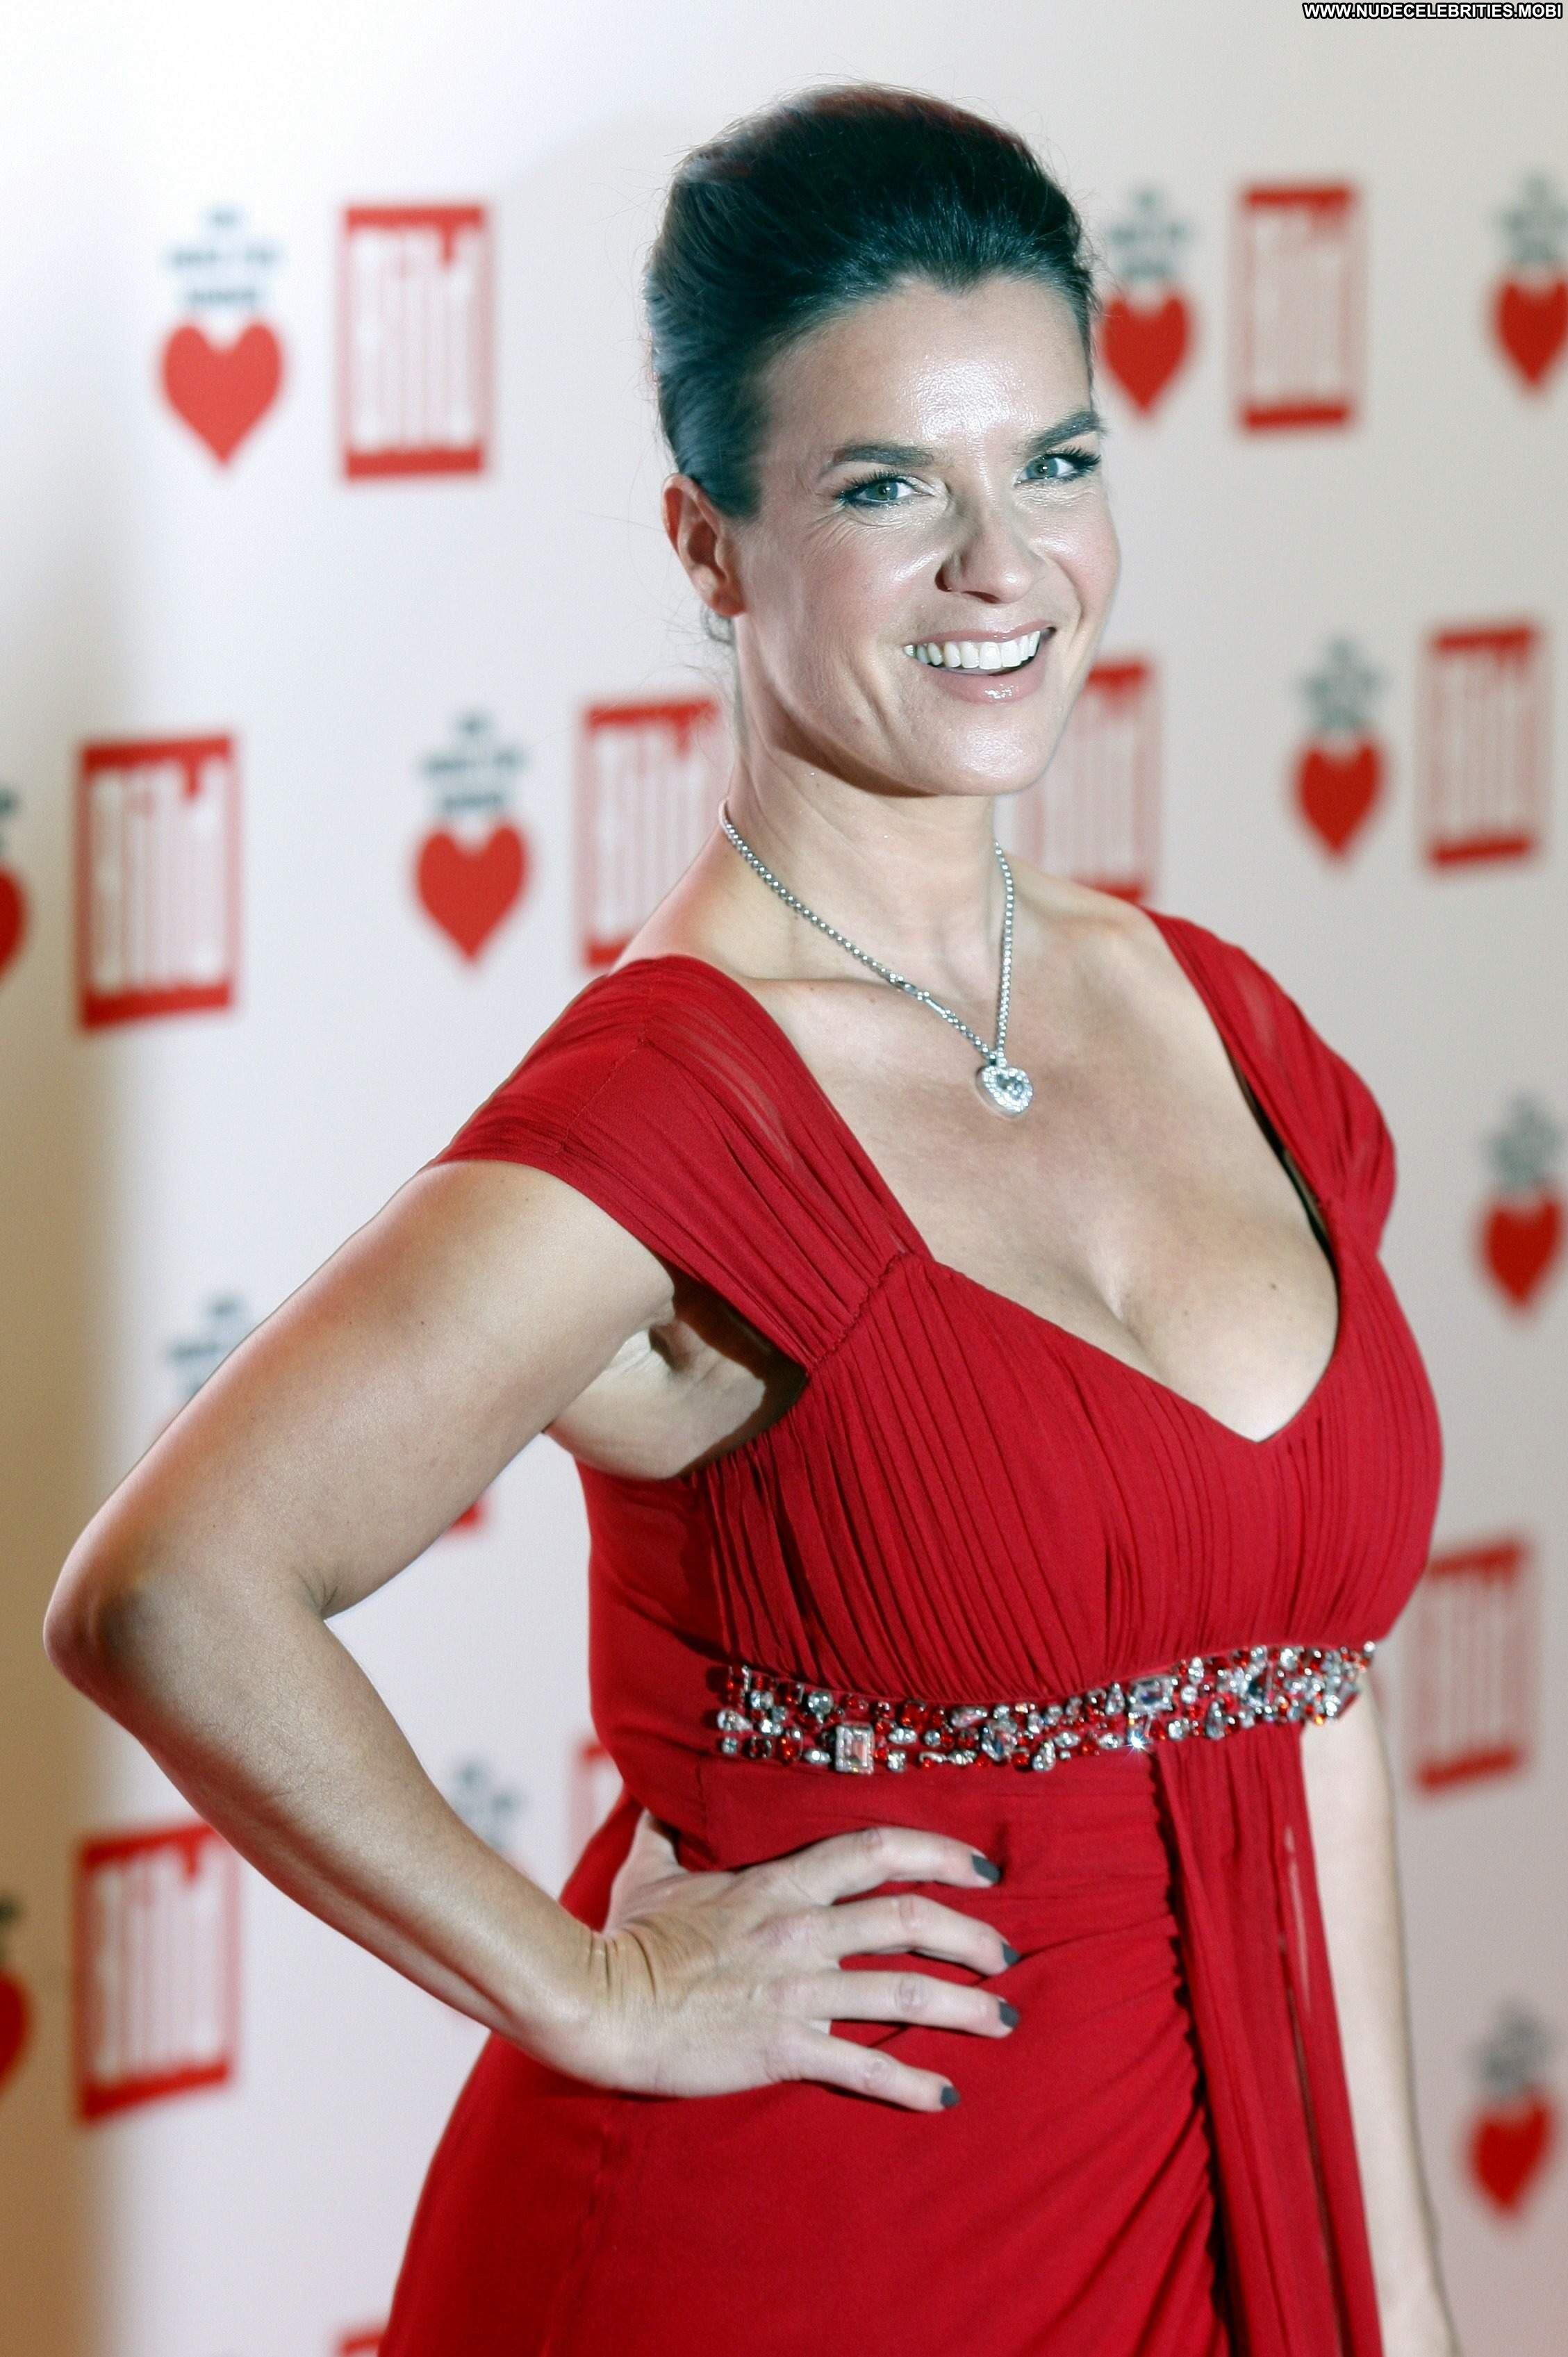 Katarina Witt No Source Celebrity Beautiful Babe Posing